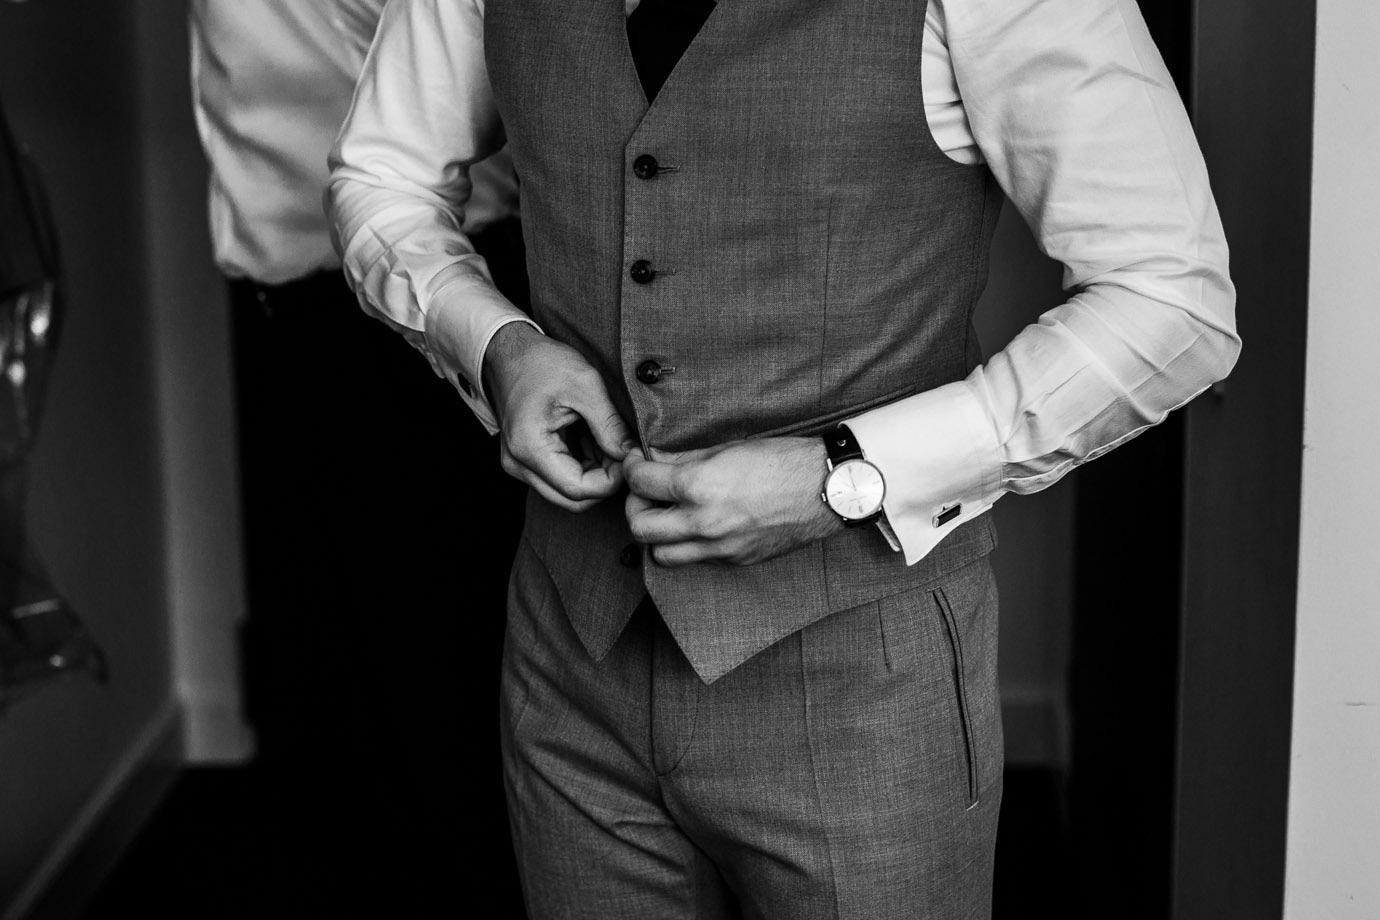 dobry garnitur do ślubu